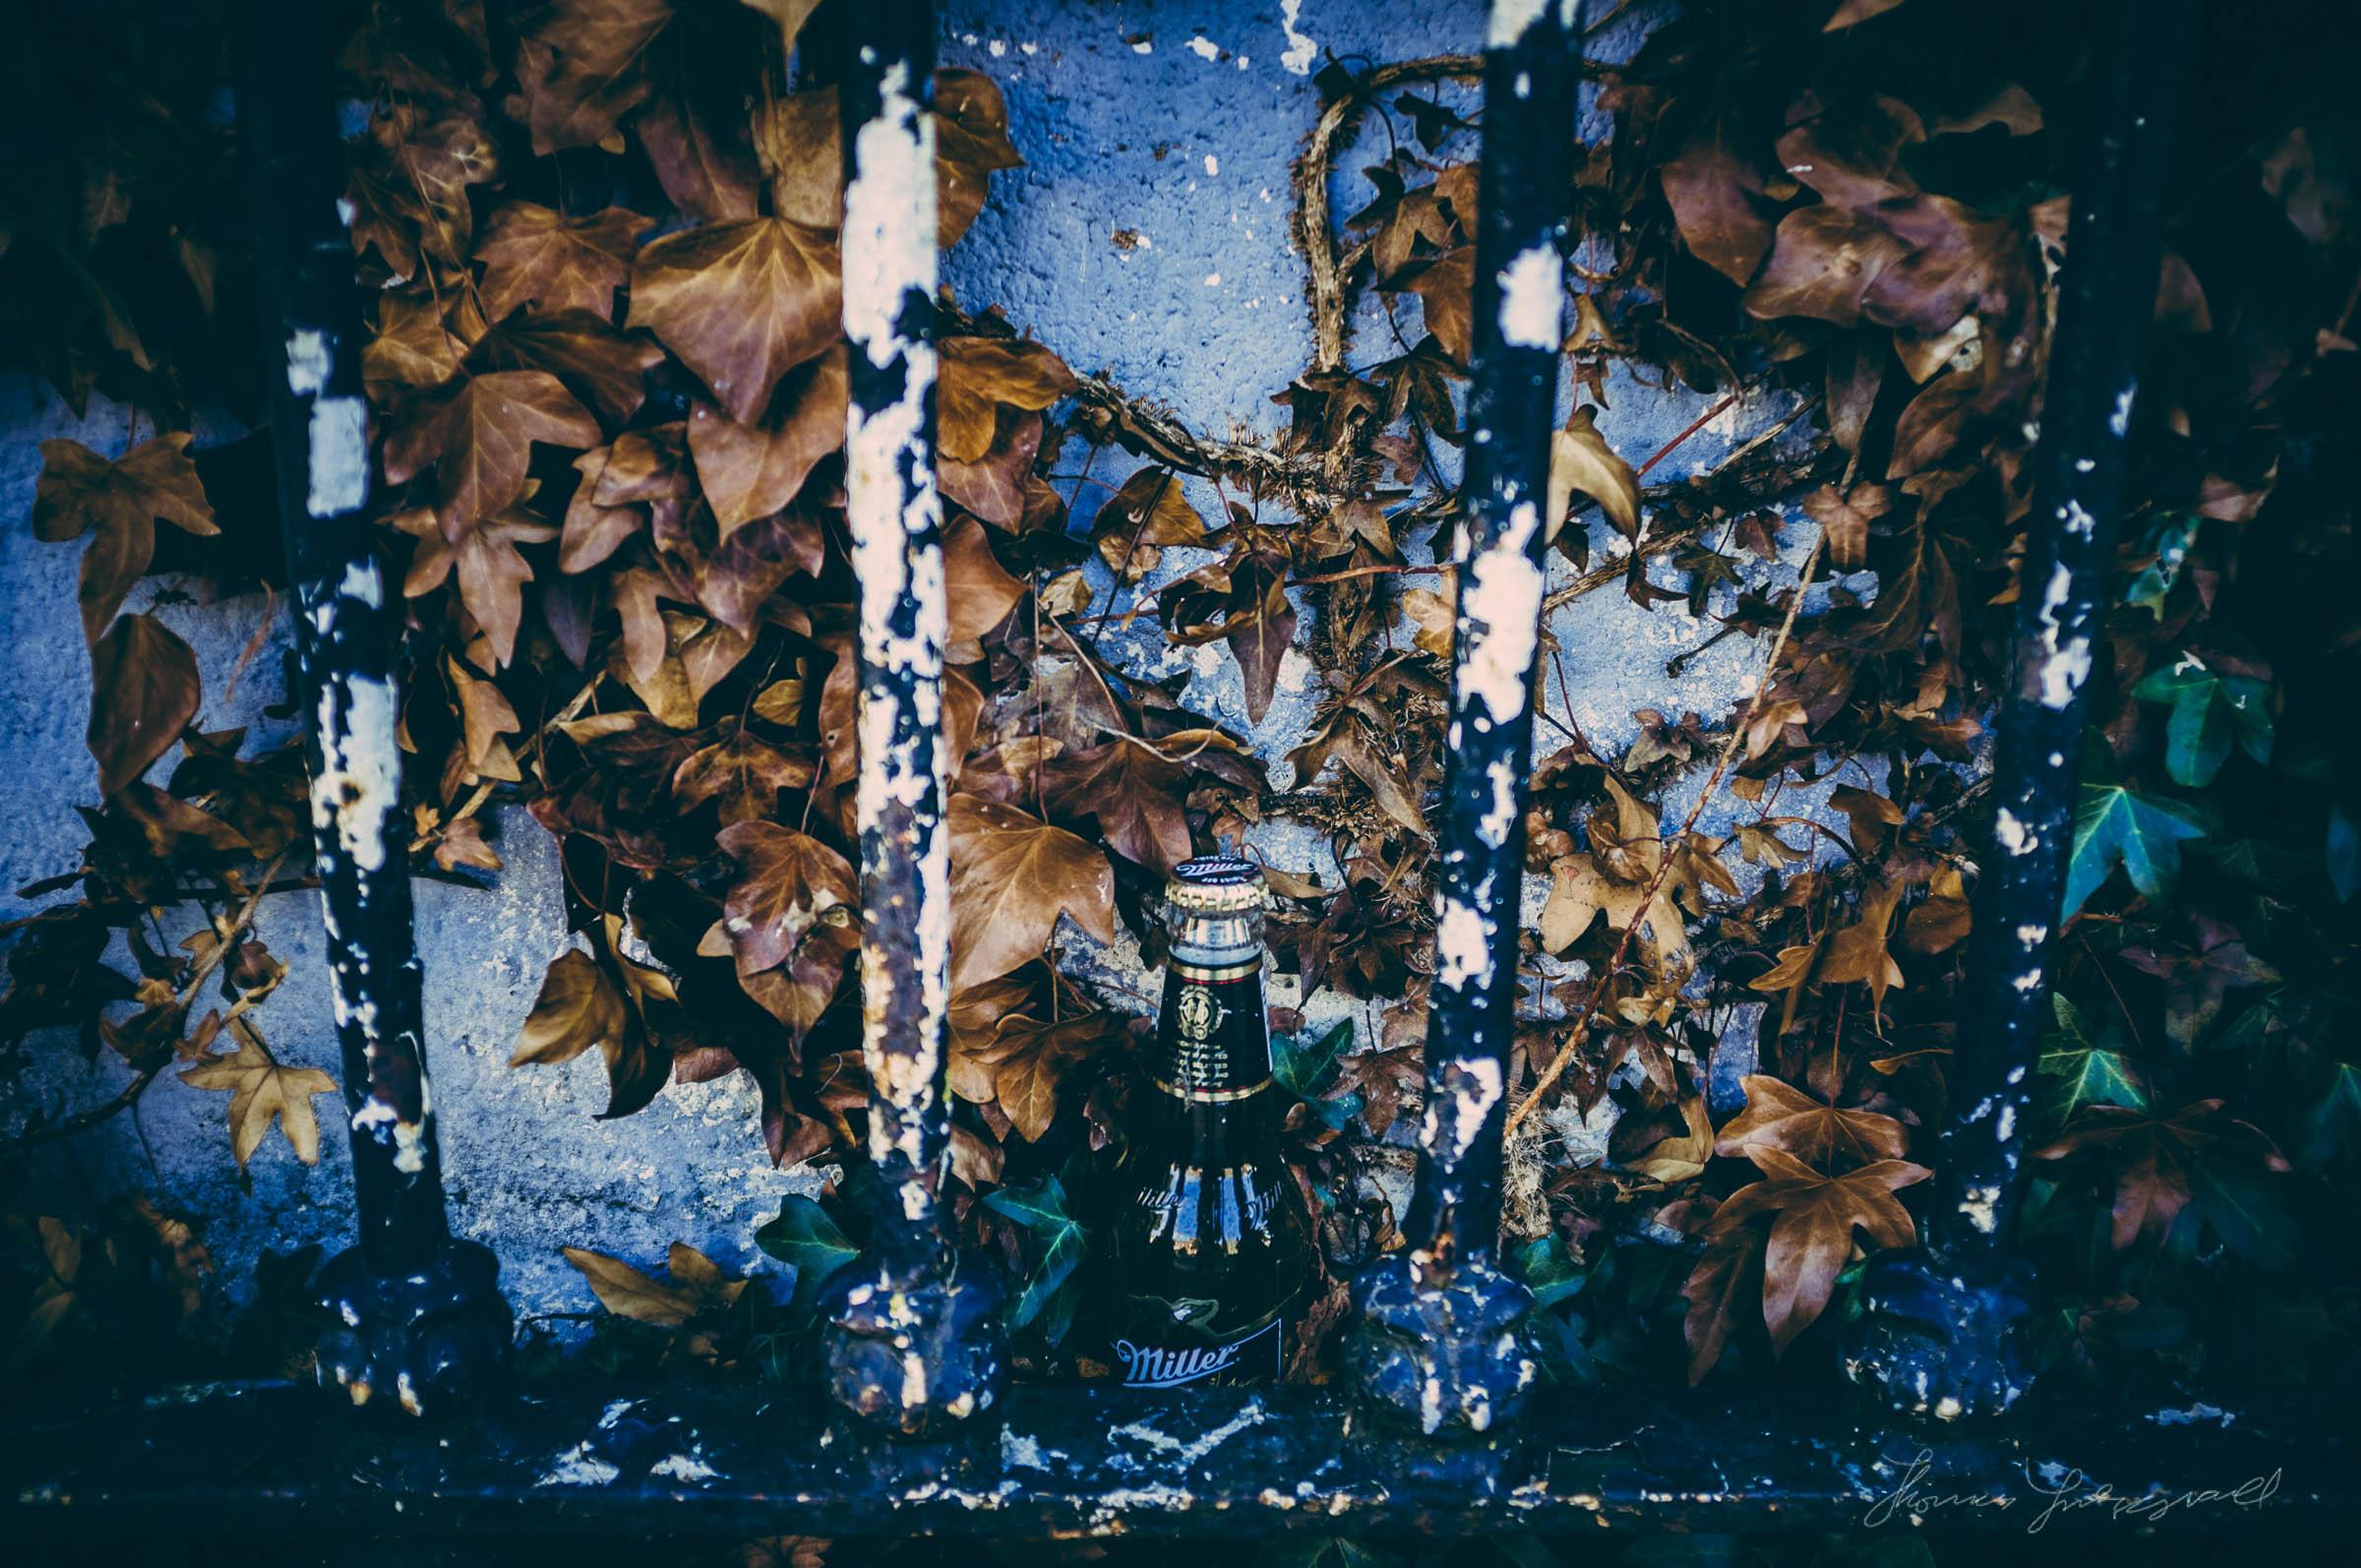 Autumn-In-the-City-01.jpg